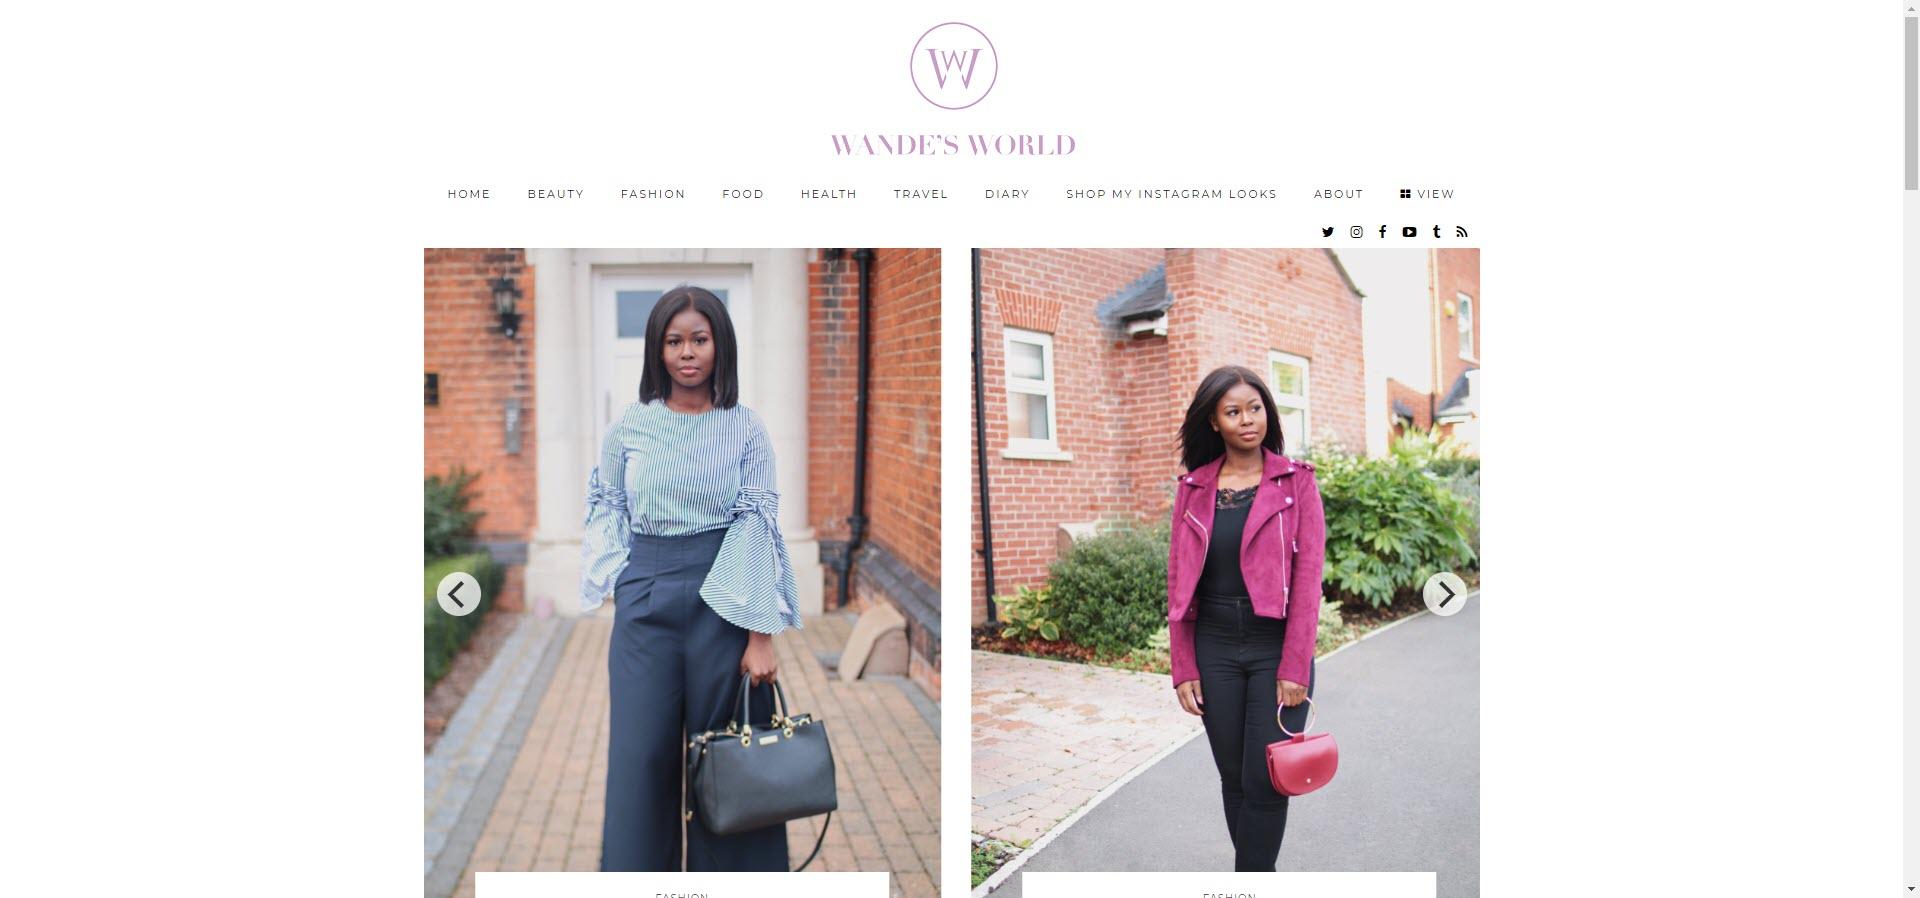 wandesworld best beauty blogs